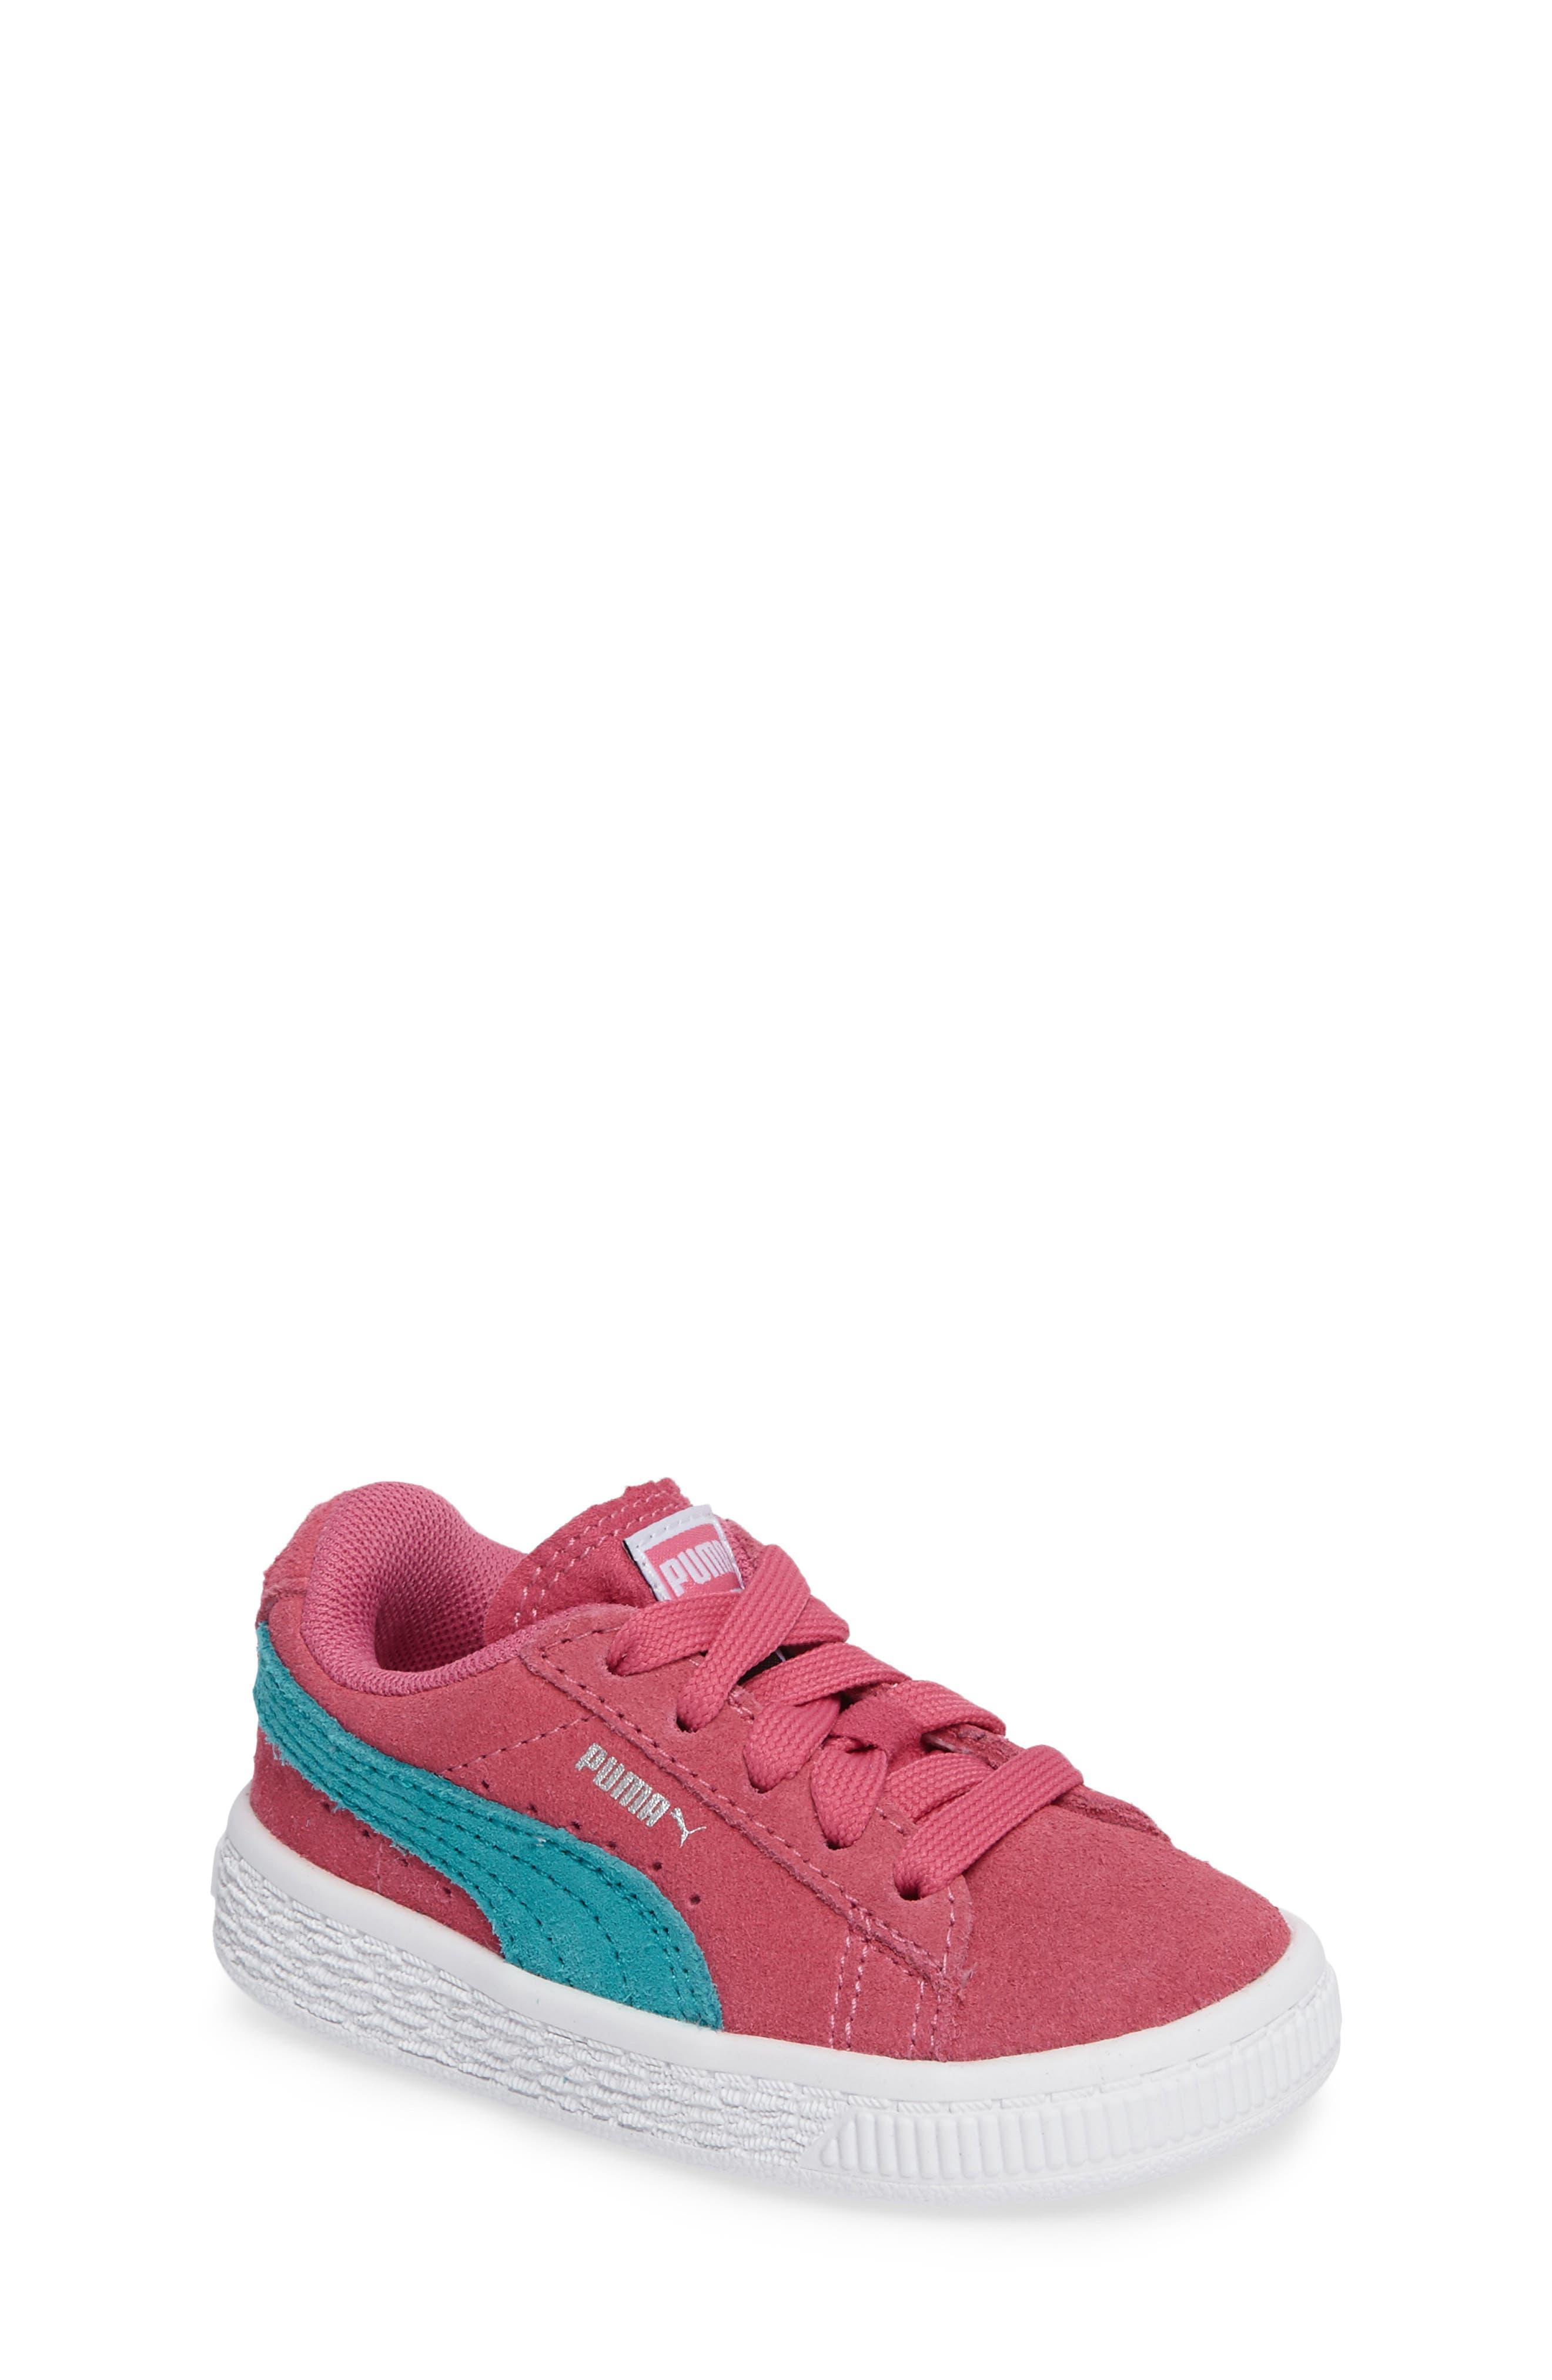 Suede Sneaker,                             Main thumbnail 1, color,                             690